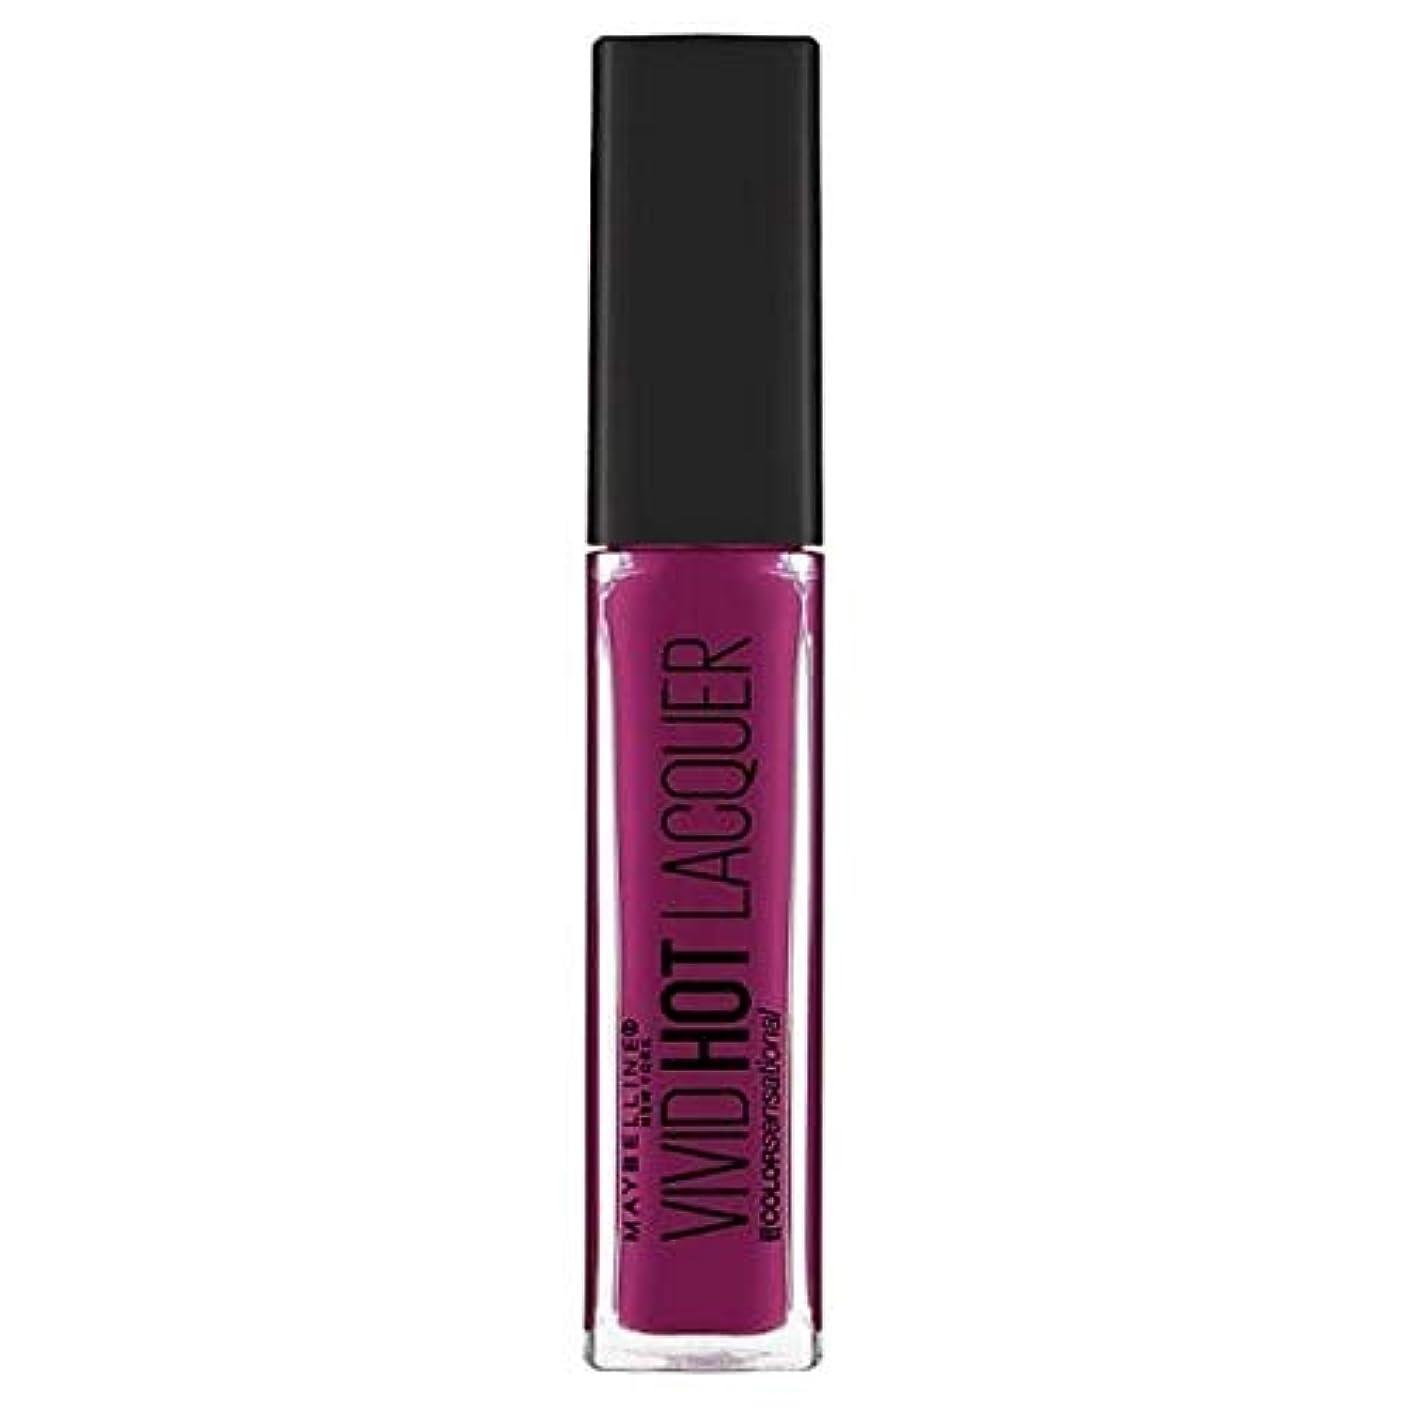 [Maybelline ] メイベリンの色鮮やかなセンセーショナルなホットラッカー強迫観念 - Maybelline Color Sensational Vivid Hot Lacquer Obsession [並行輸入品]